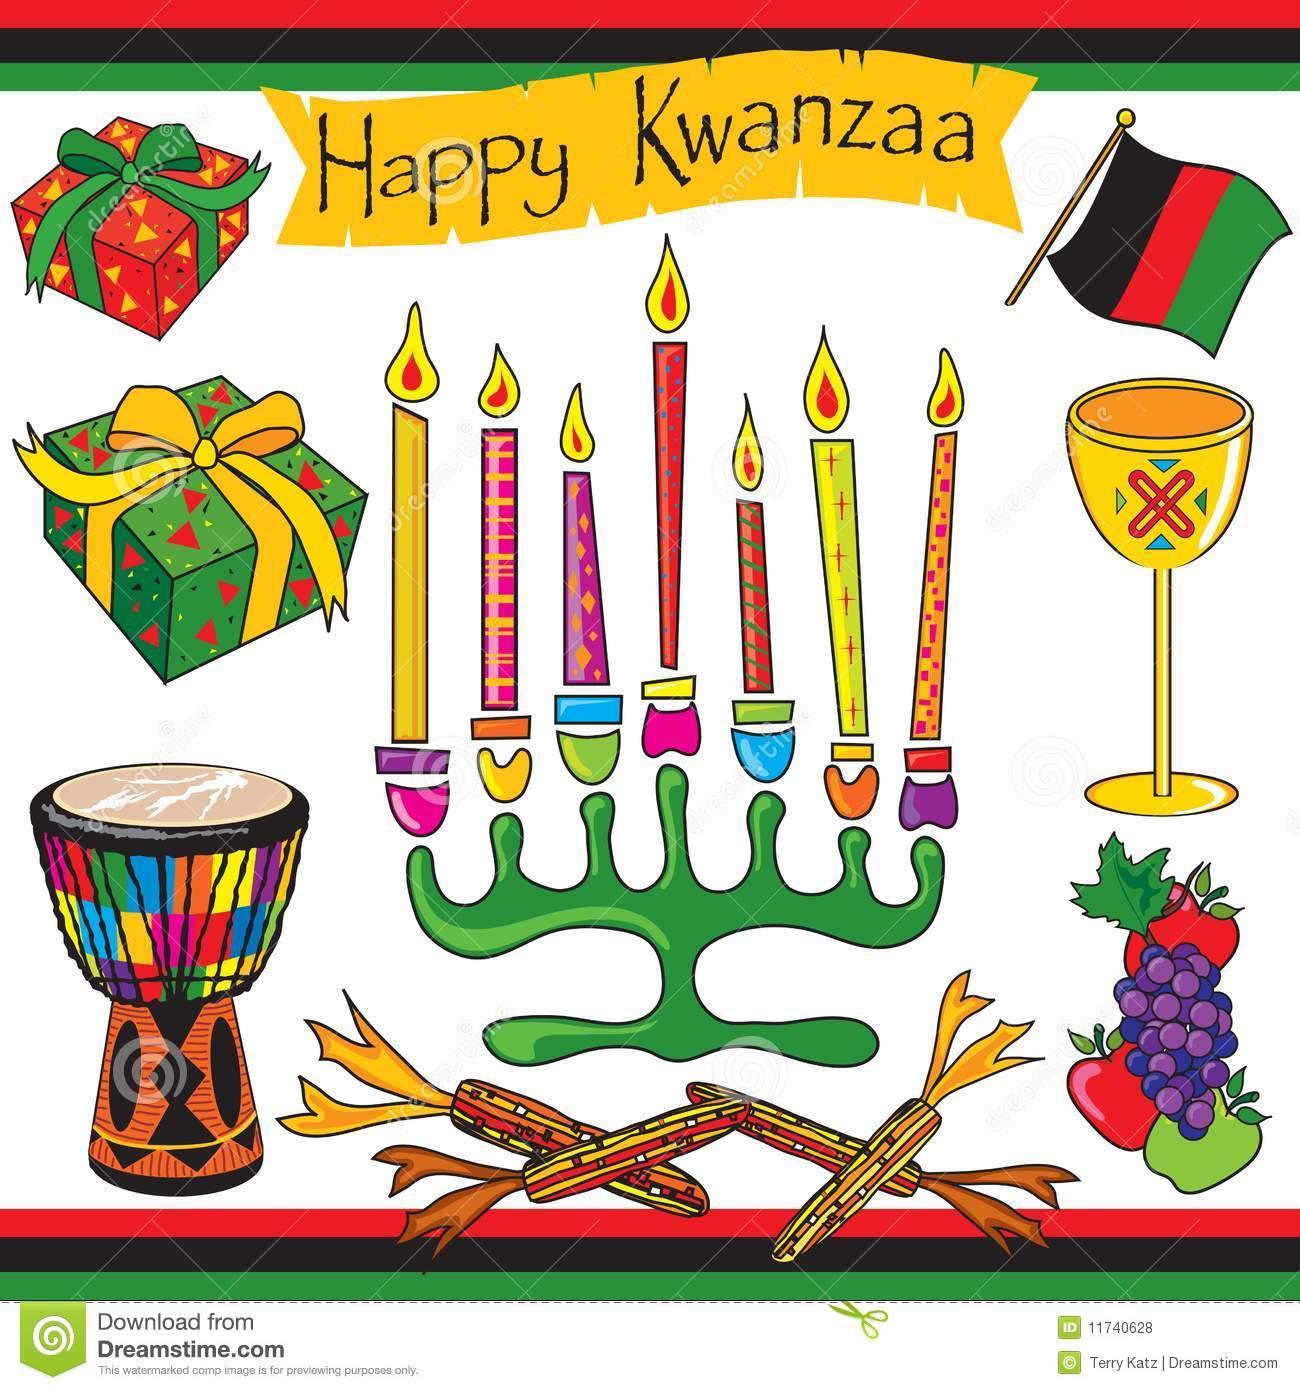 Happy Kwanzaa clip art and icons